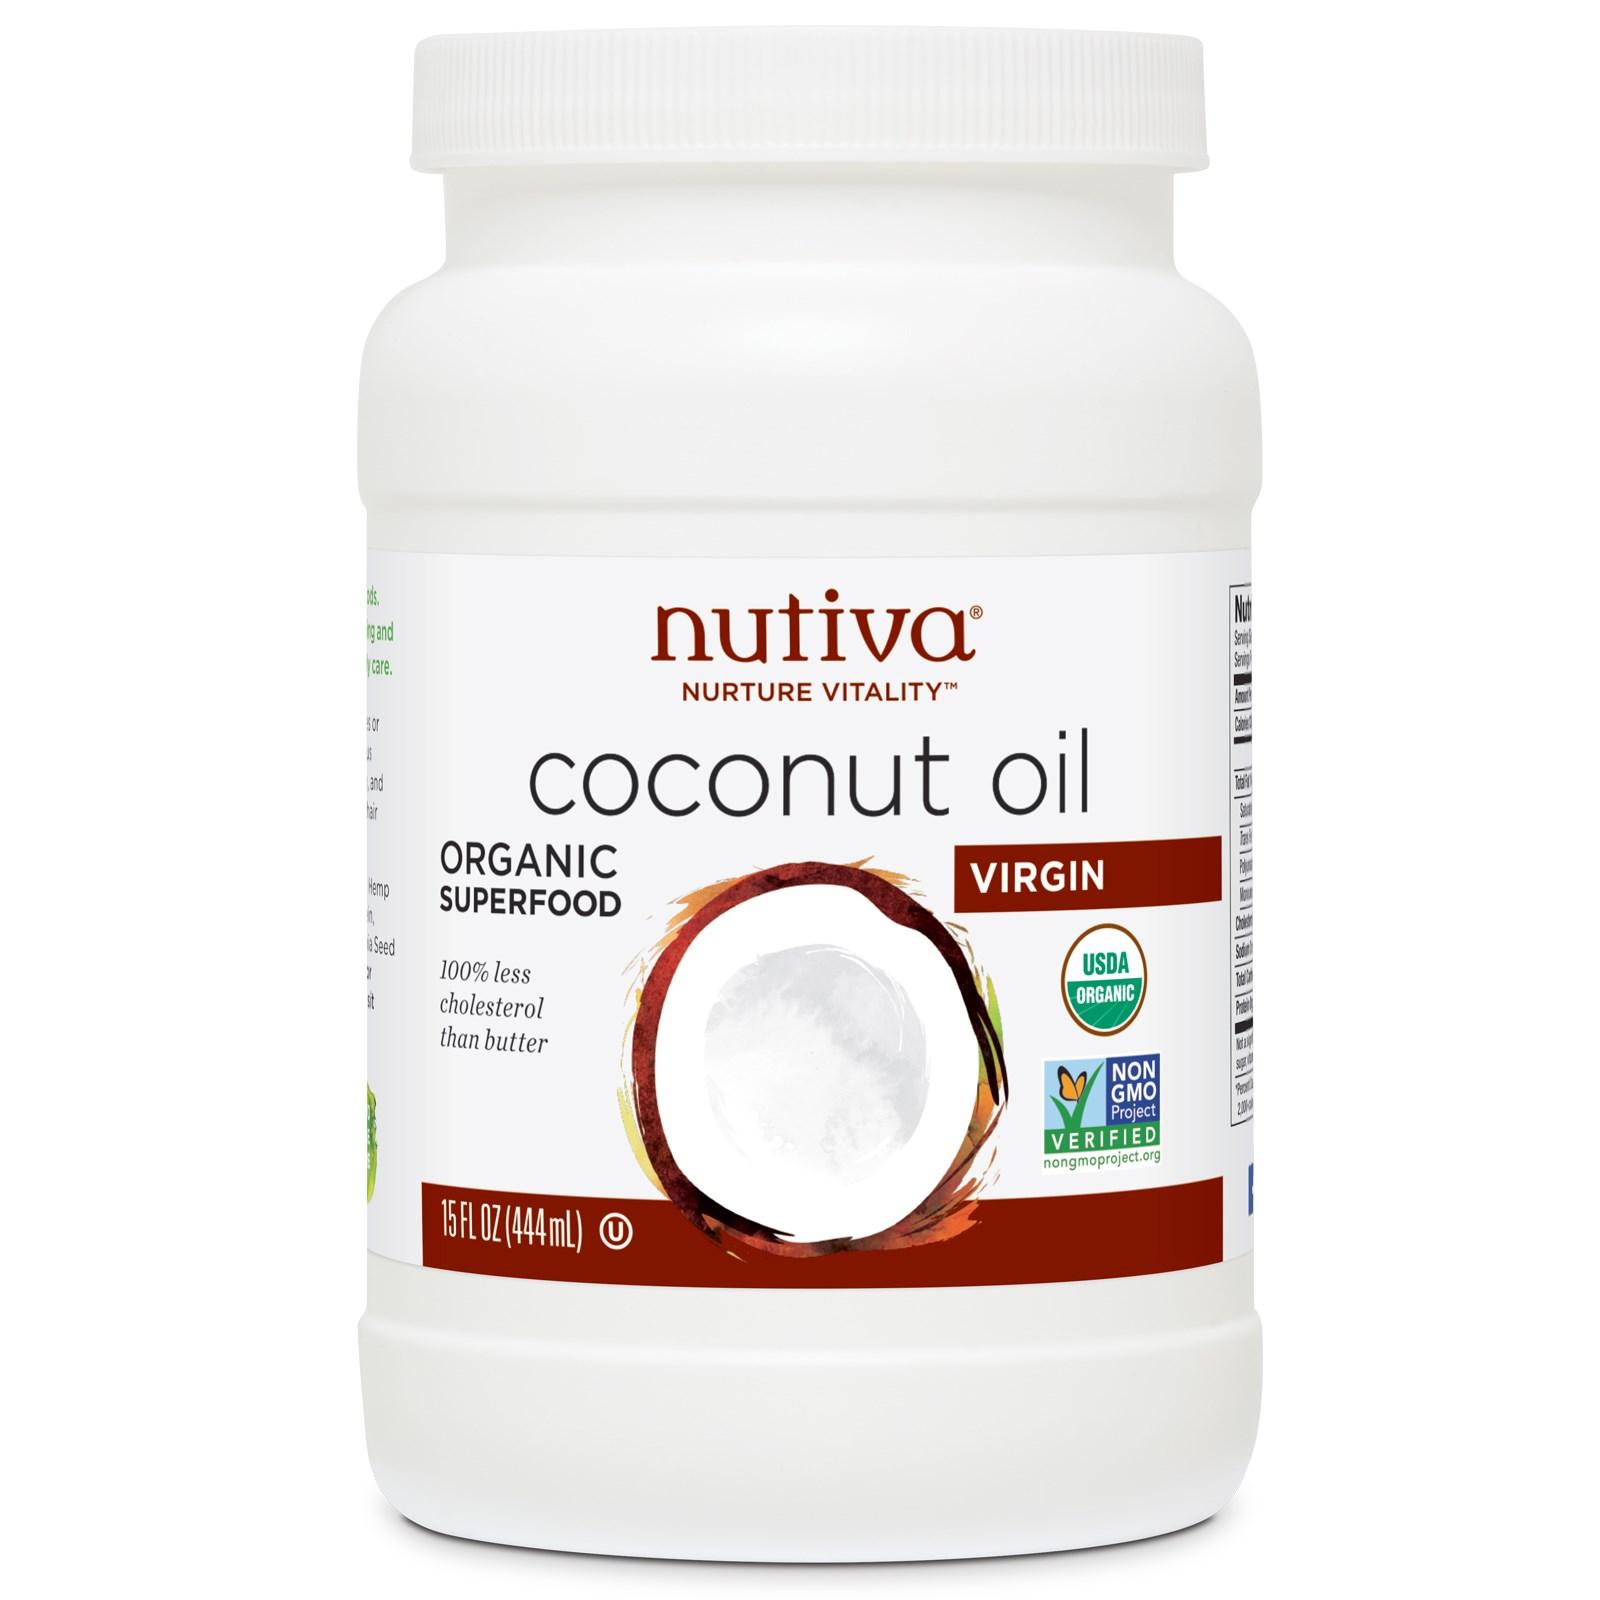 кокосовое масло холодной отжима Nurture Vitality, Nutiva (444 мл)